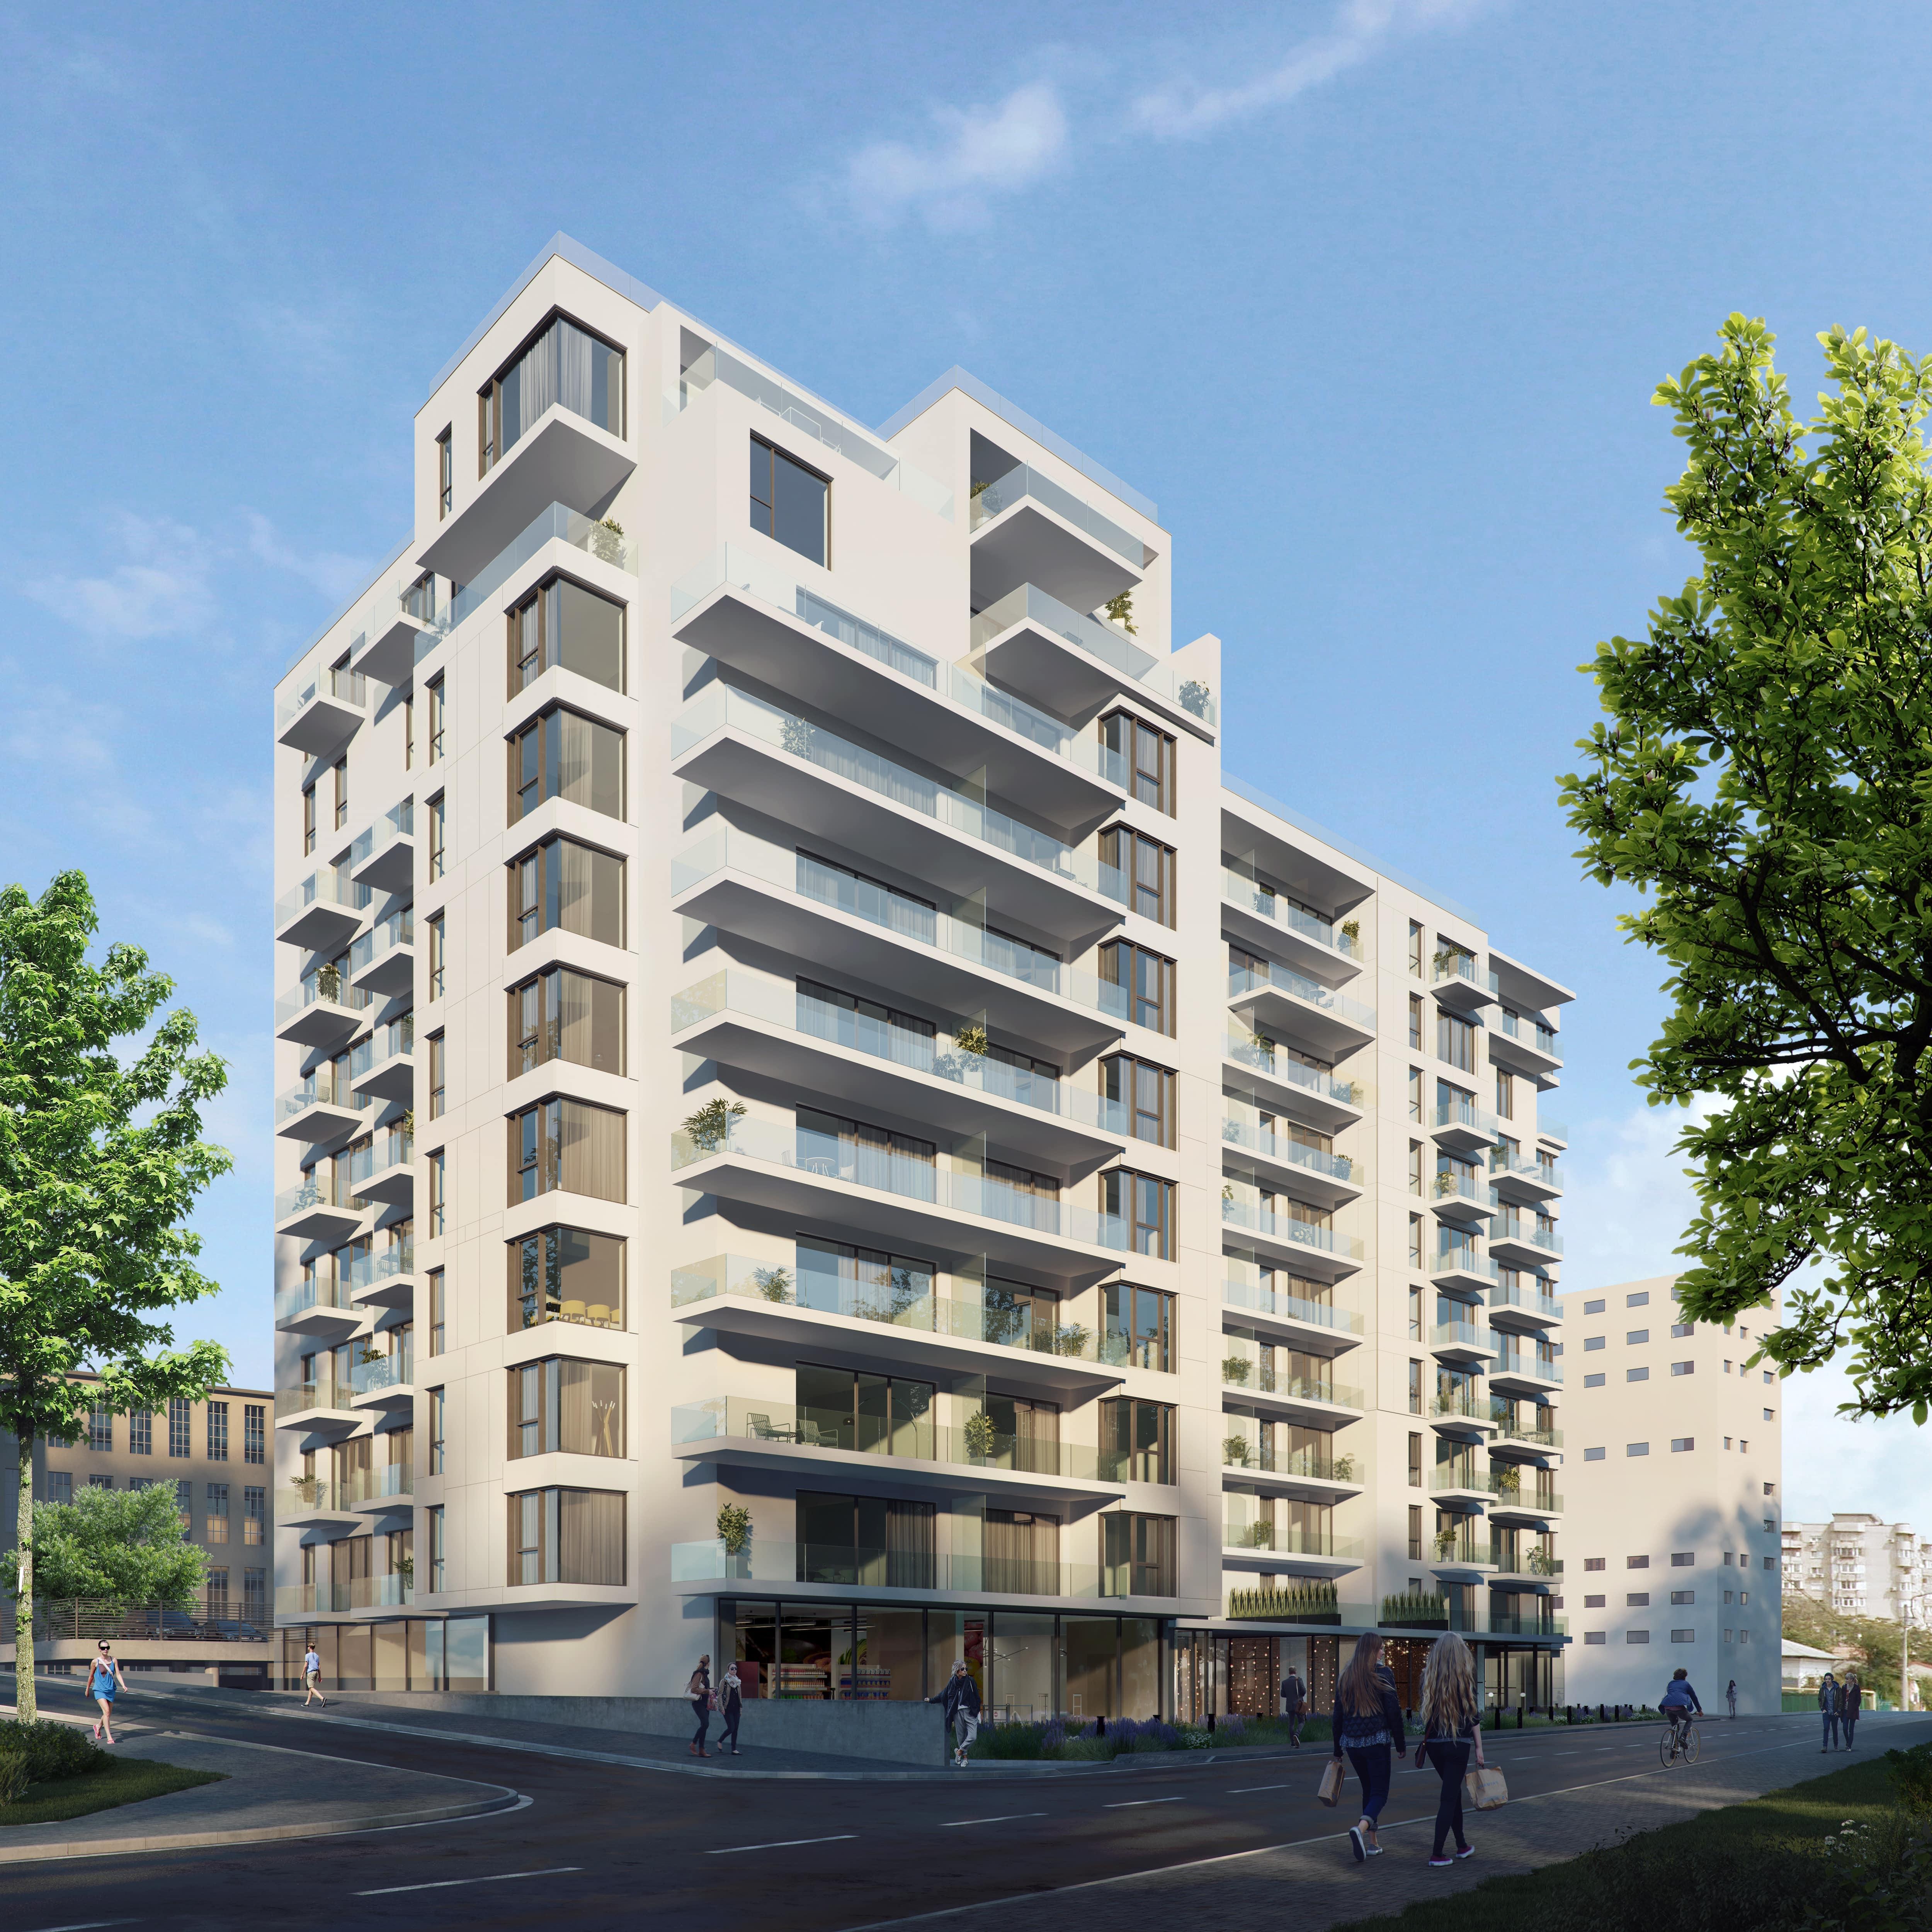 https://ahe-ro.s3.amazonaws.com/8112/penthouse-si-apartamente-unirii-%286%29.jpg